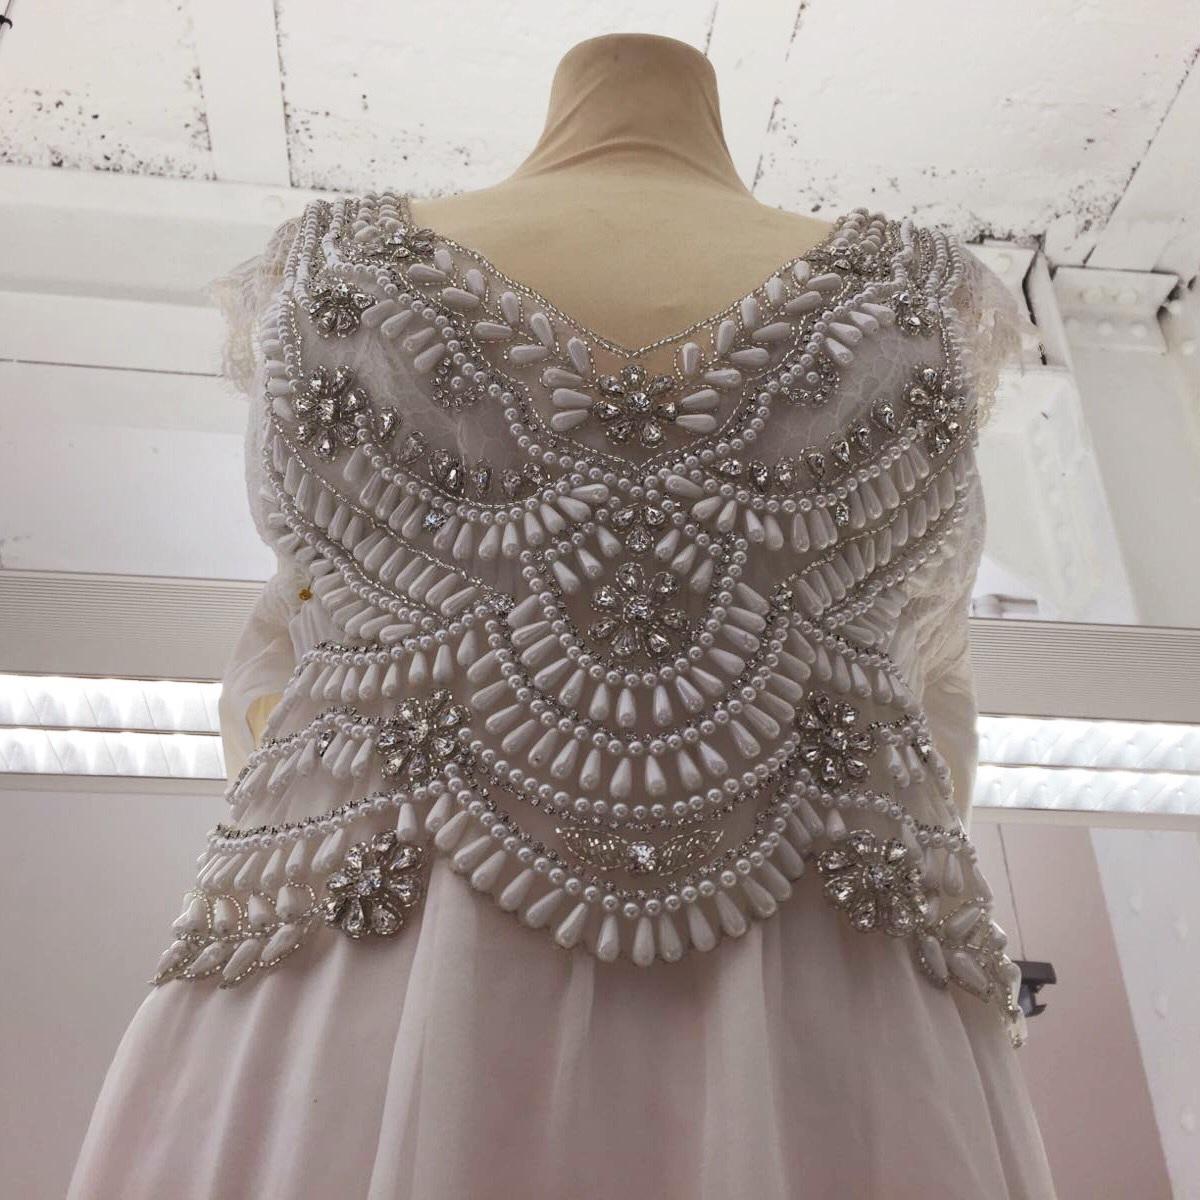 couture-wedding-dresses.jpg